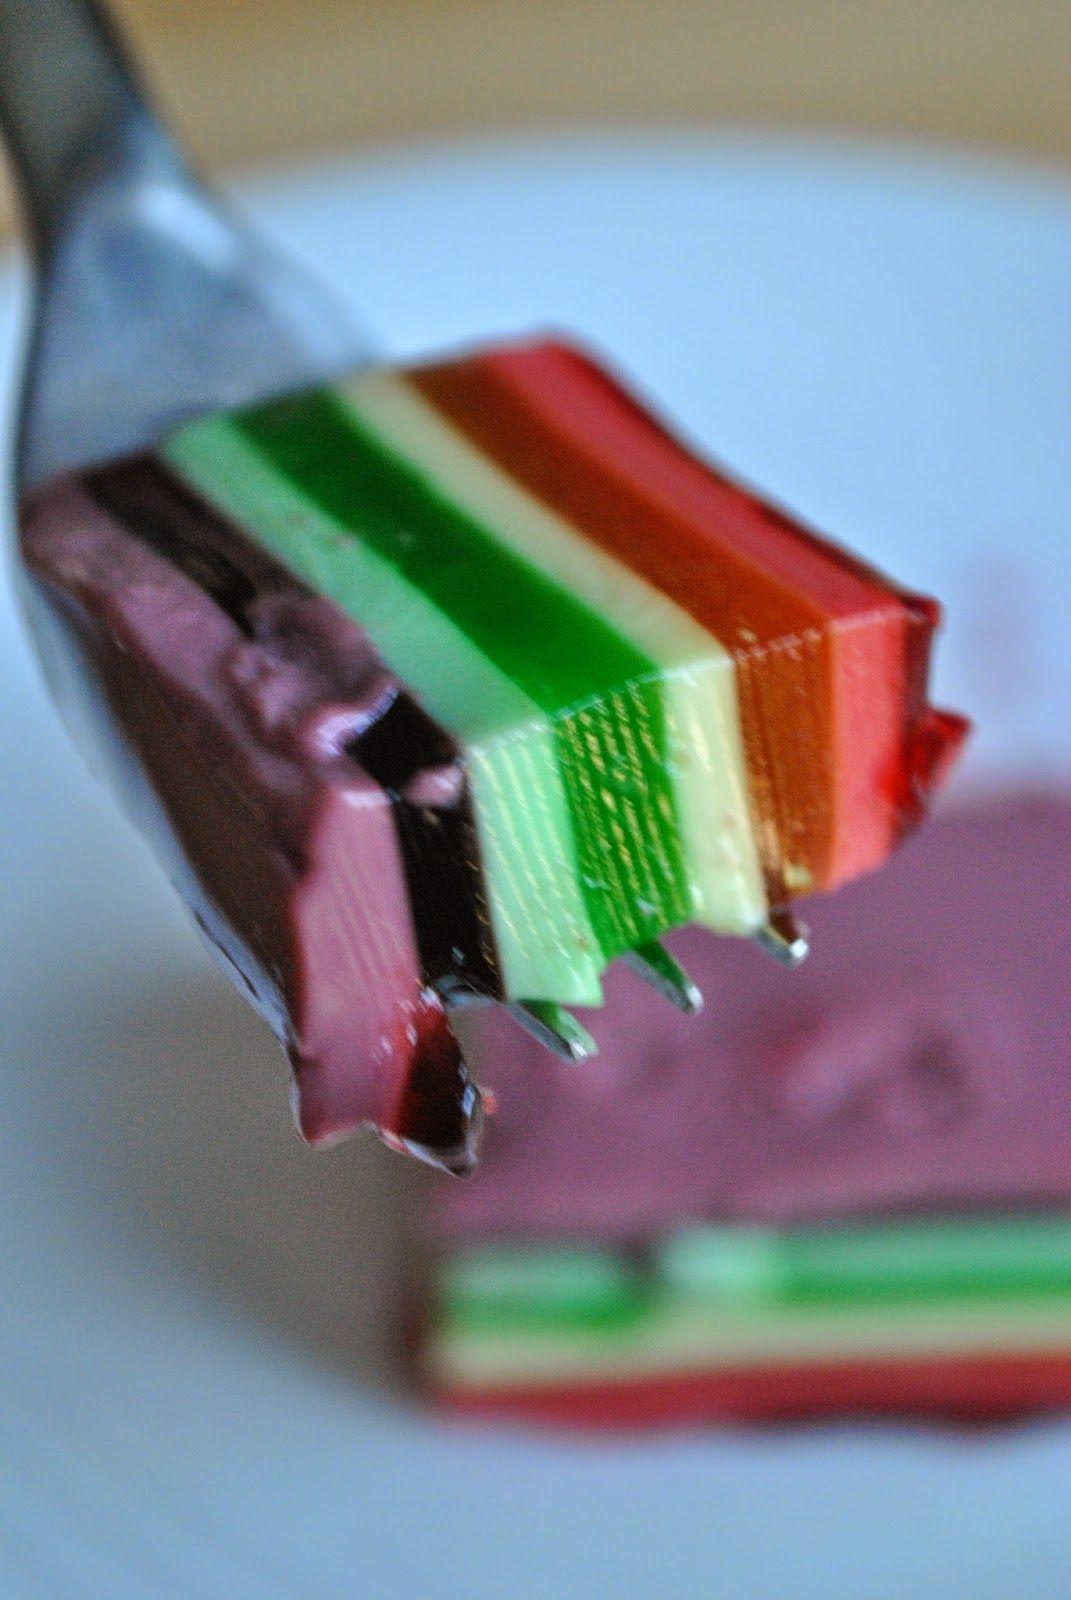 Layered Jello Dessert With Sour Cream Layered Jello Sour Cream Desserts Jello With Sour Cream Recipe